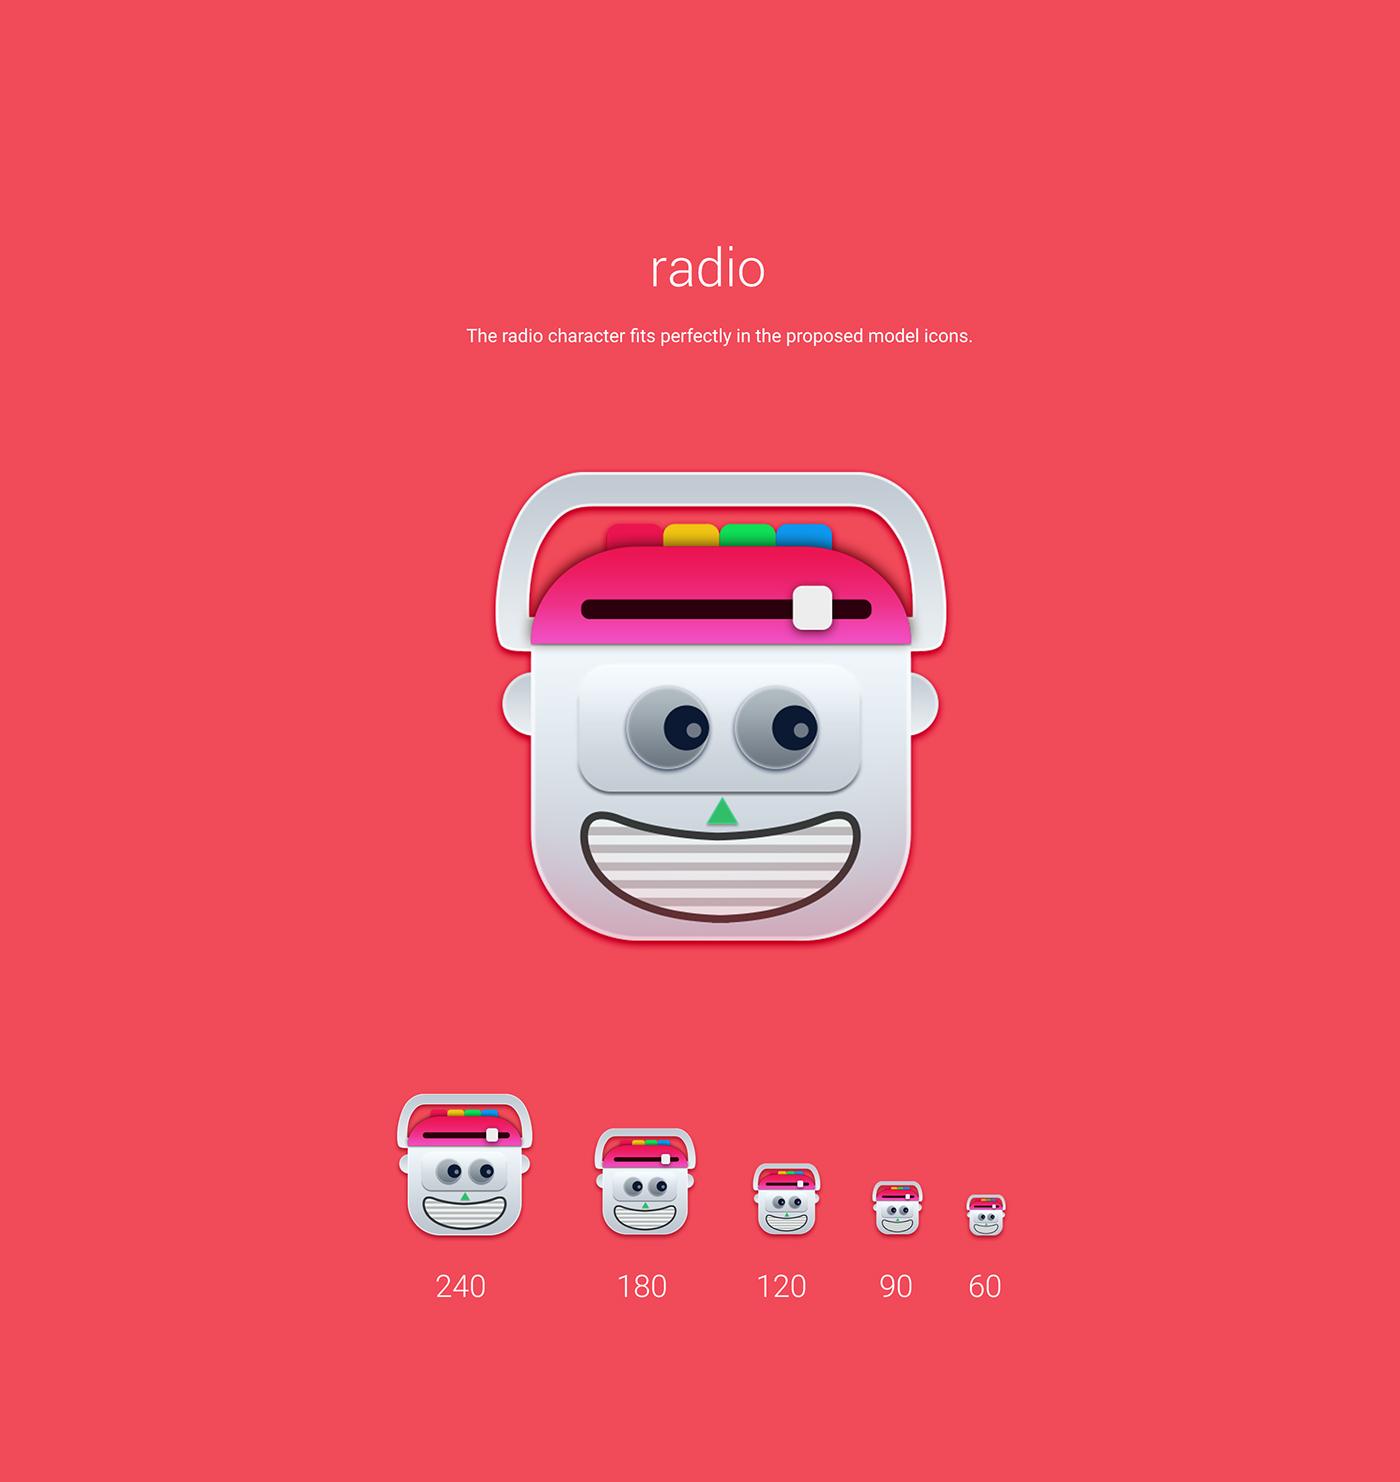 disney-pixar-toy-story-android-icons-leo-natsume-10